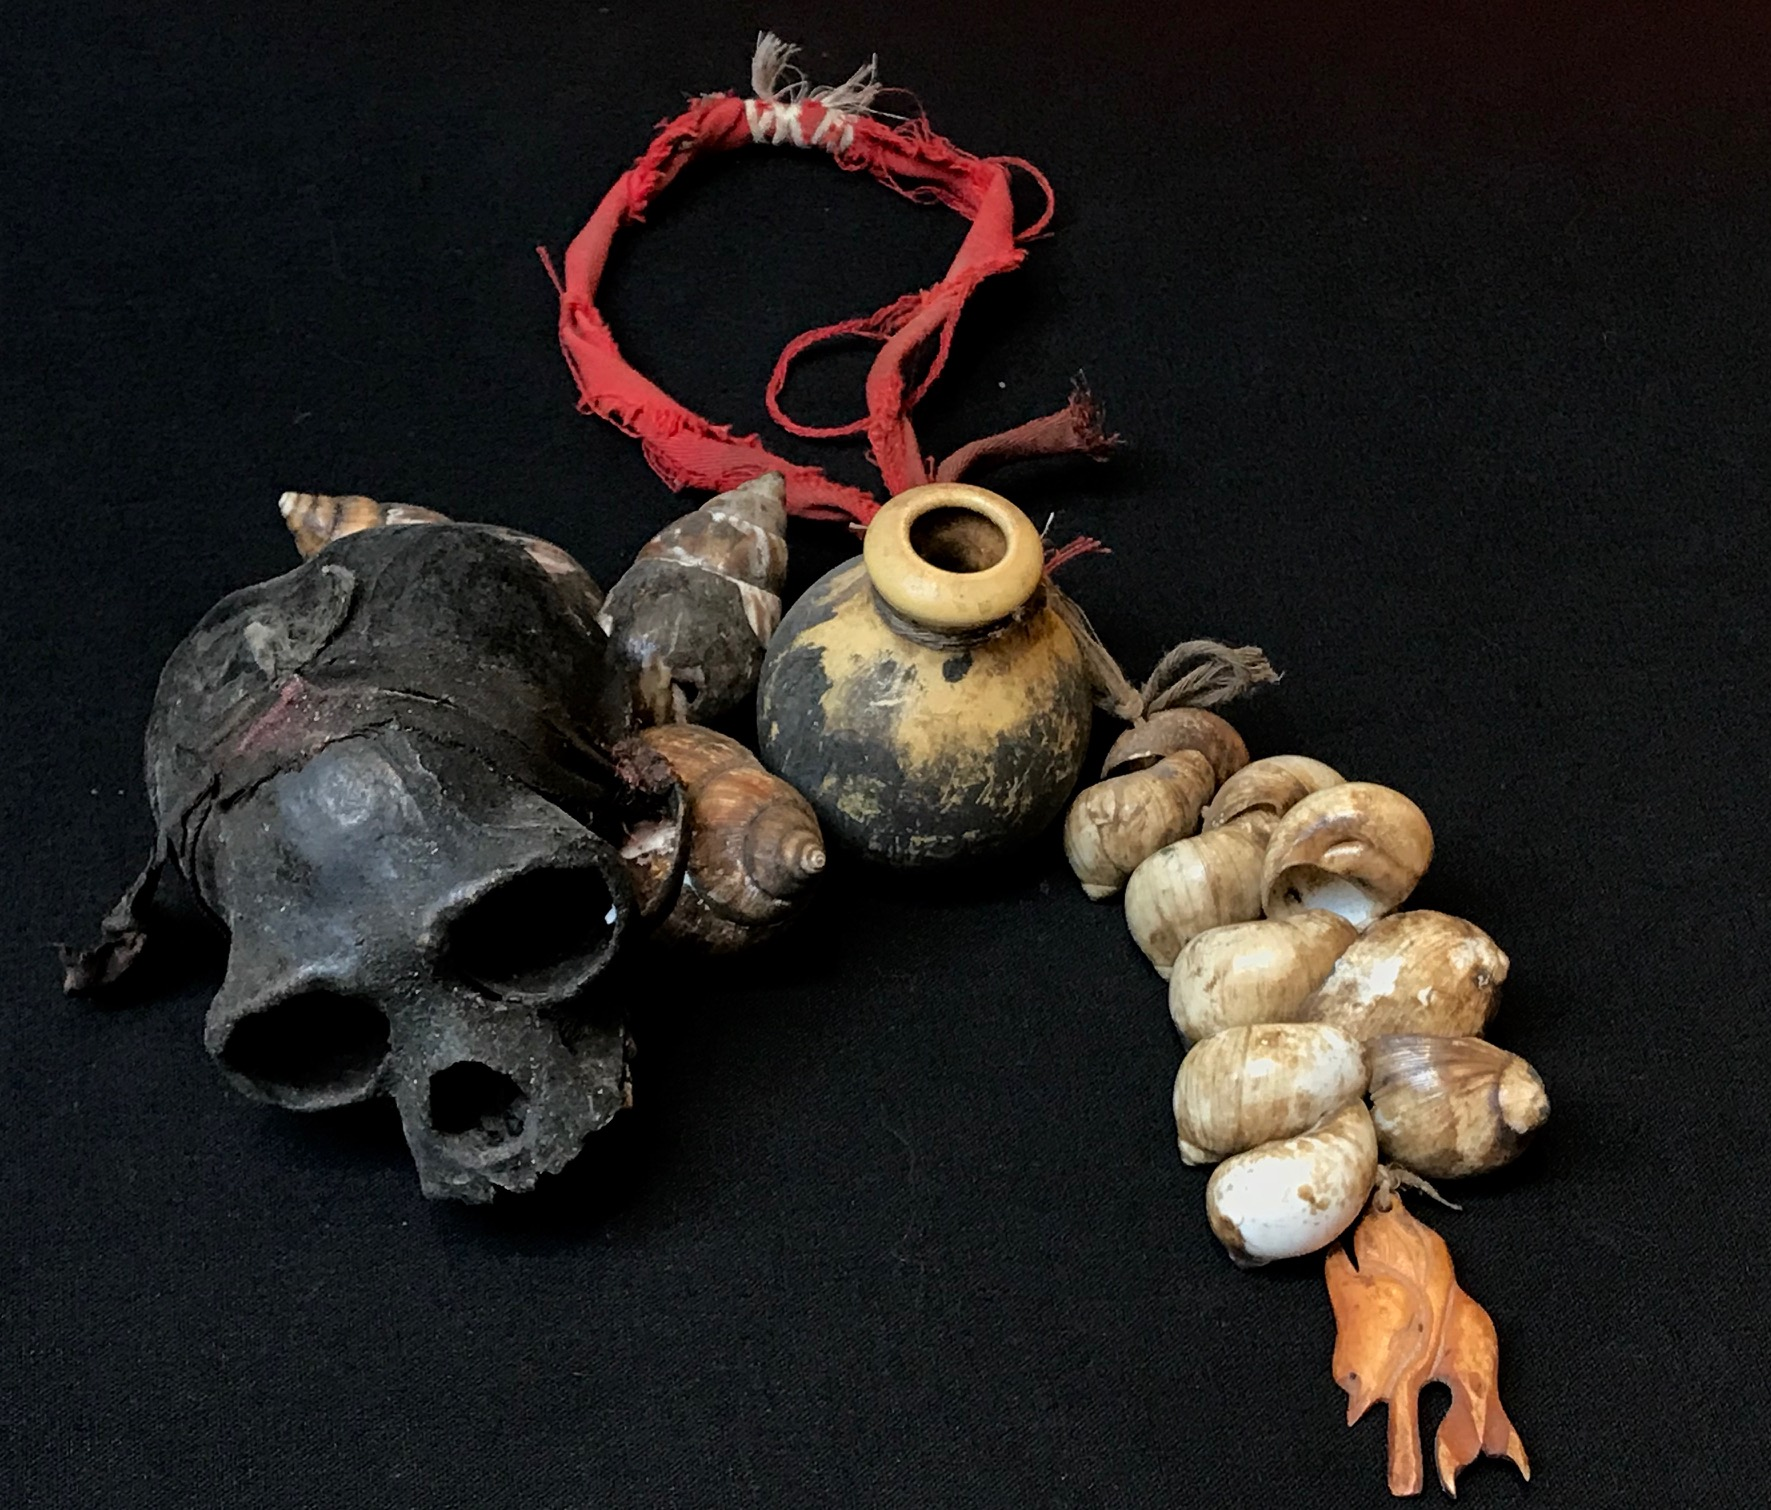 "Shaman's ritual dance rattle, Indonesia, Borneo, Dayak tribe, early 20th c., Monkey skull, sea shells, bone, ceramic beads, Shaken to scare away evil or harmful spirits, ~ 13"" x 5"""